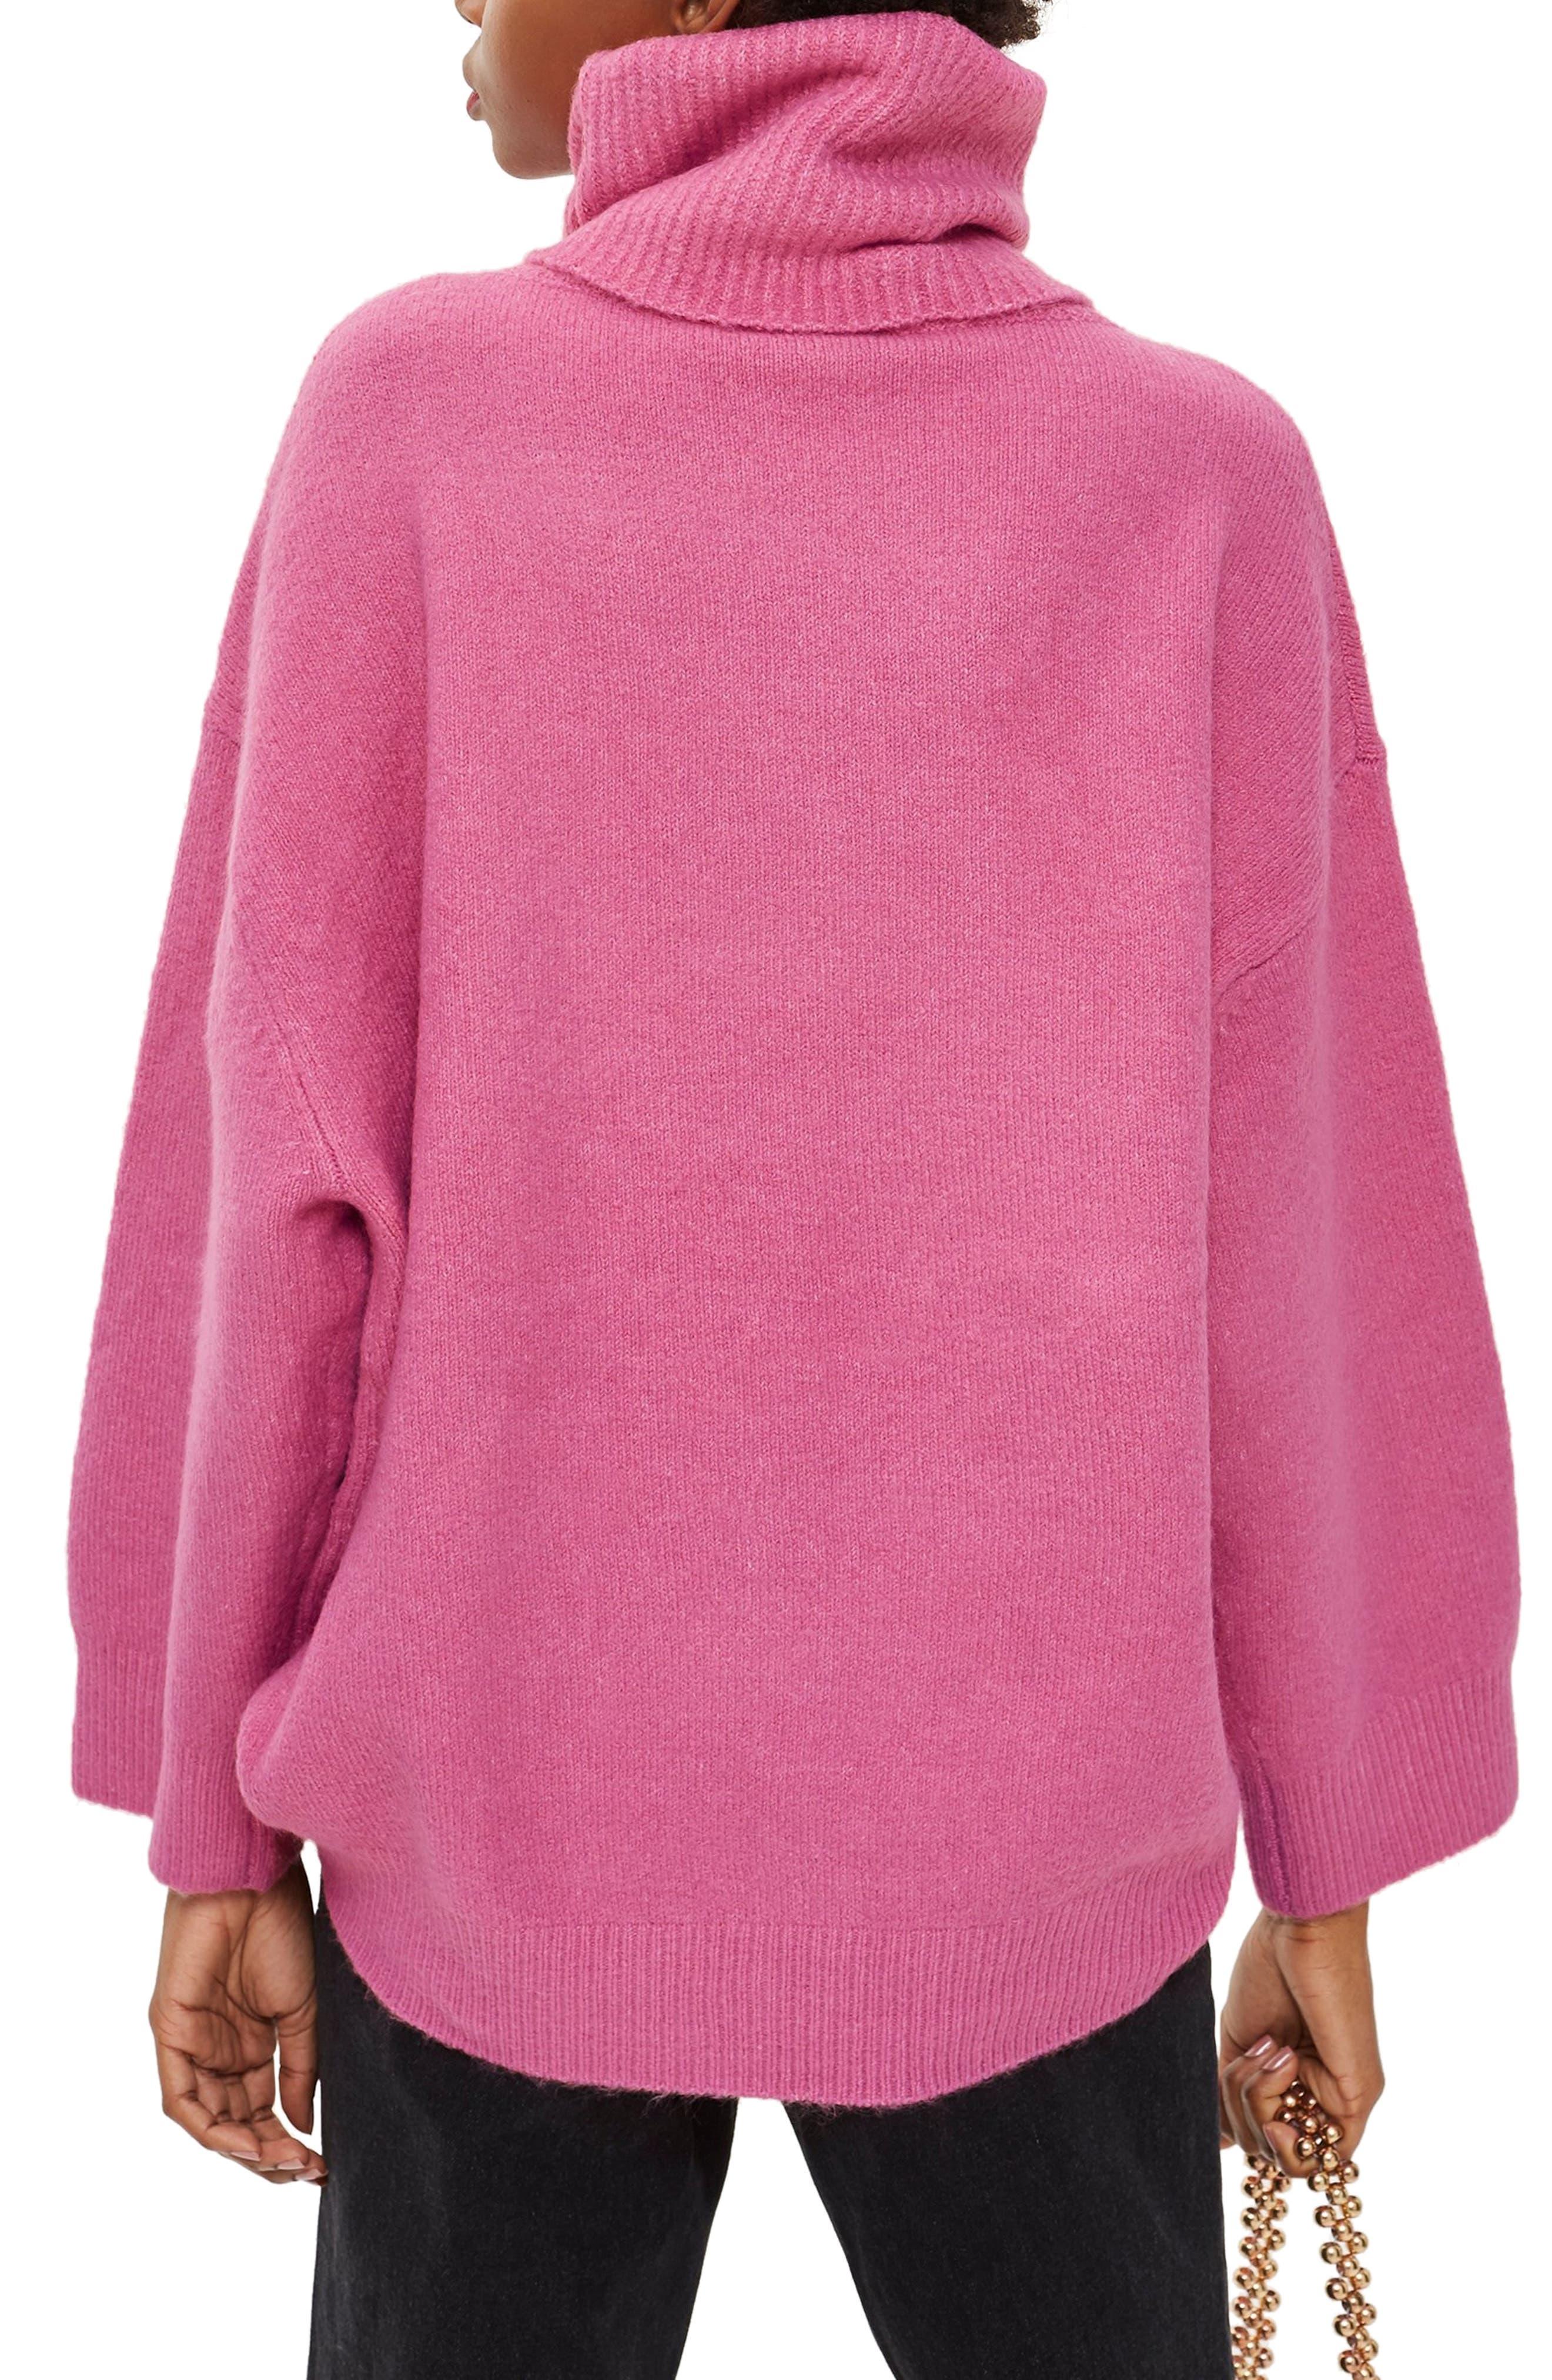 Oversize Turtleneck Sweater,                             Alternate thumbnail 2, color,                             BRIGHT PINK